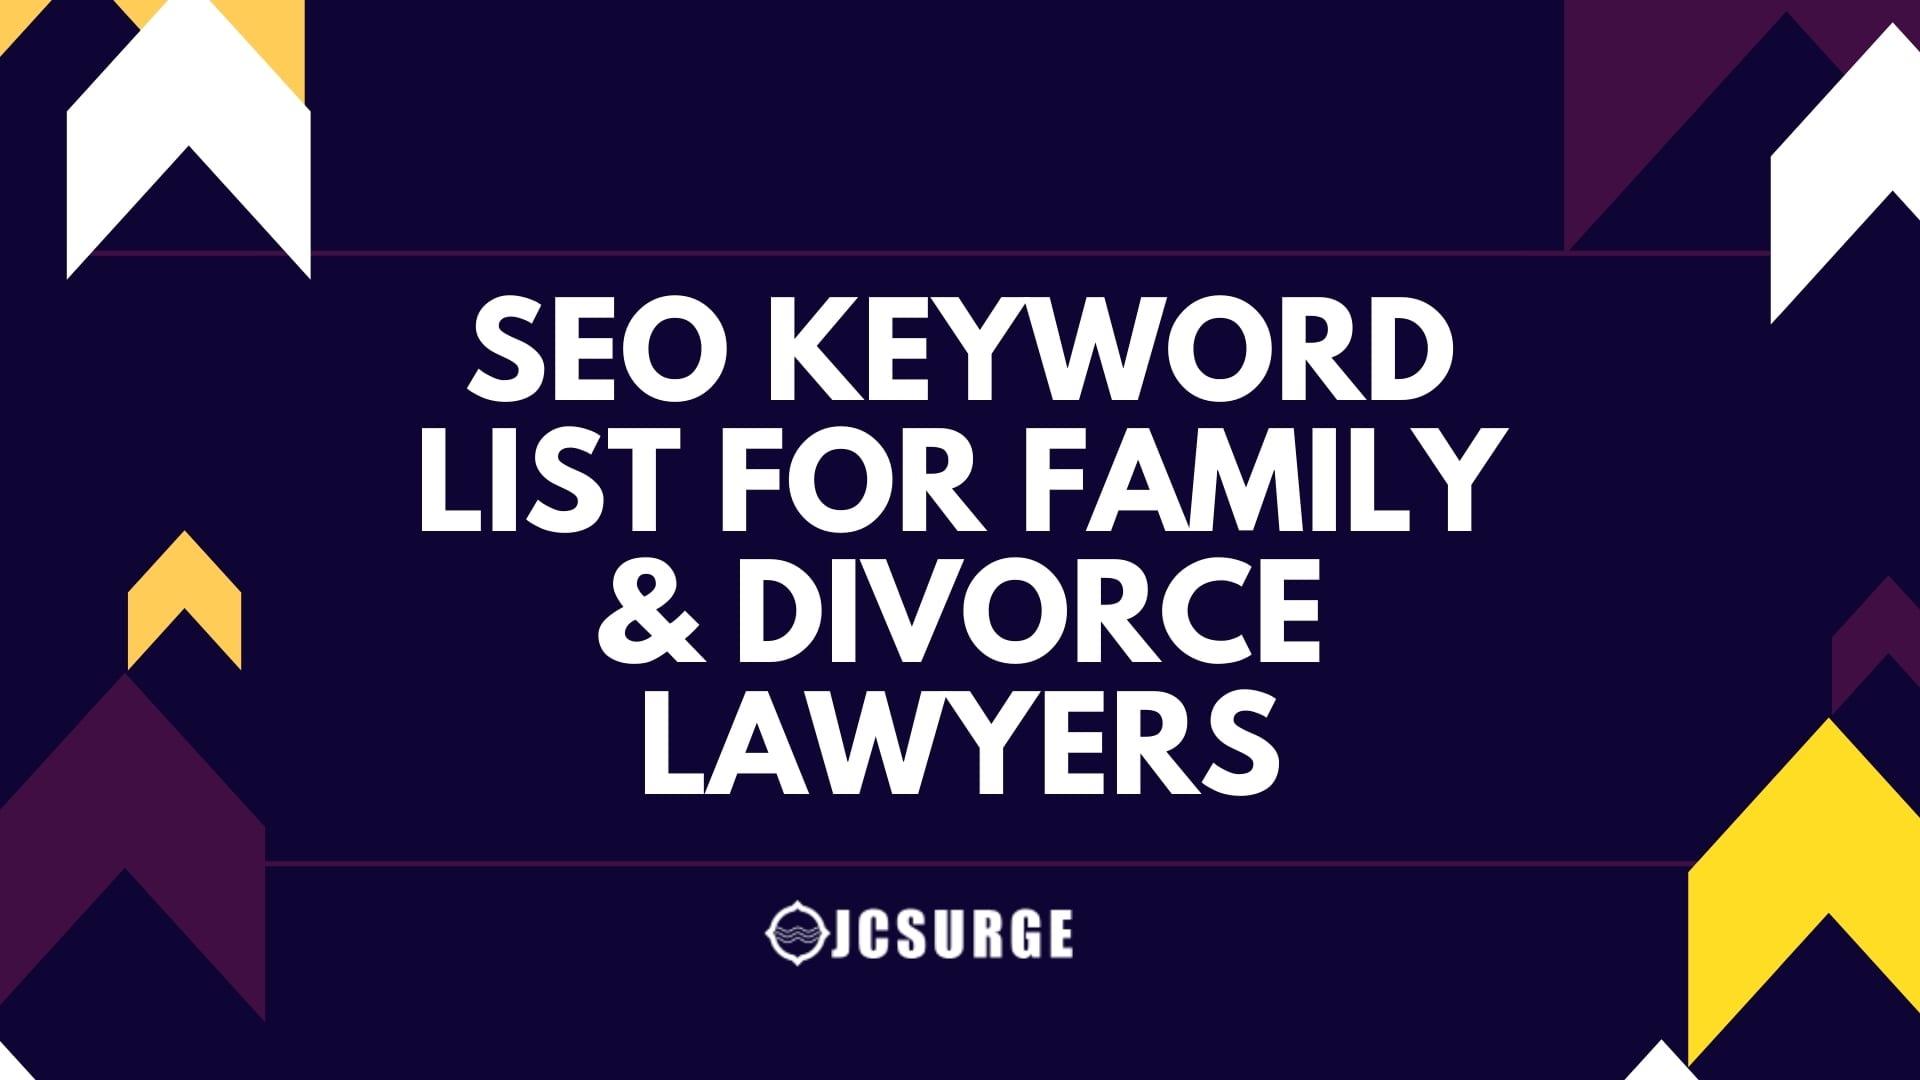 SEO KEYWORD LIST FOR FAMILY & DIVORCE LAWYERS